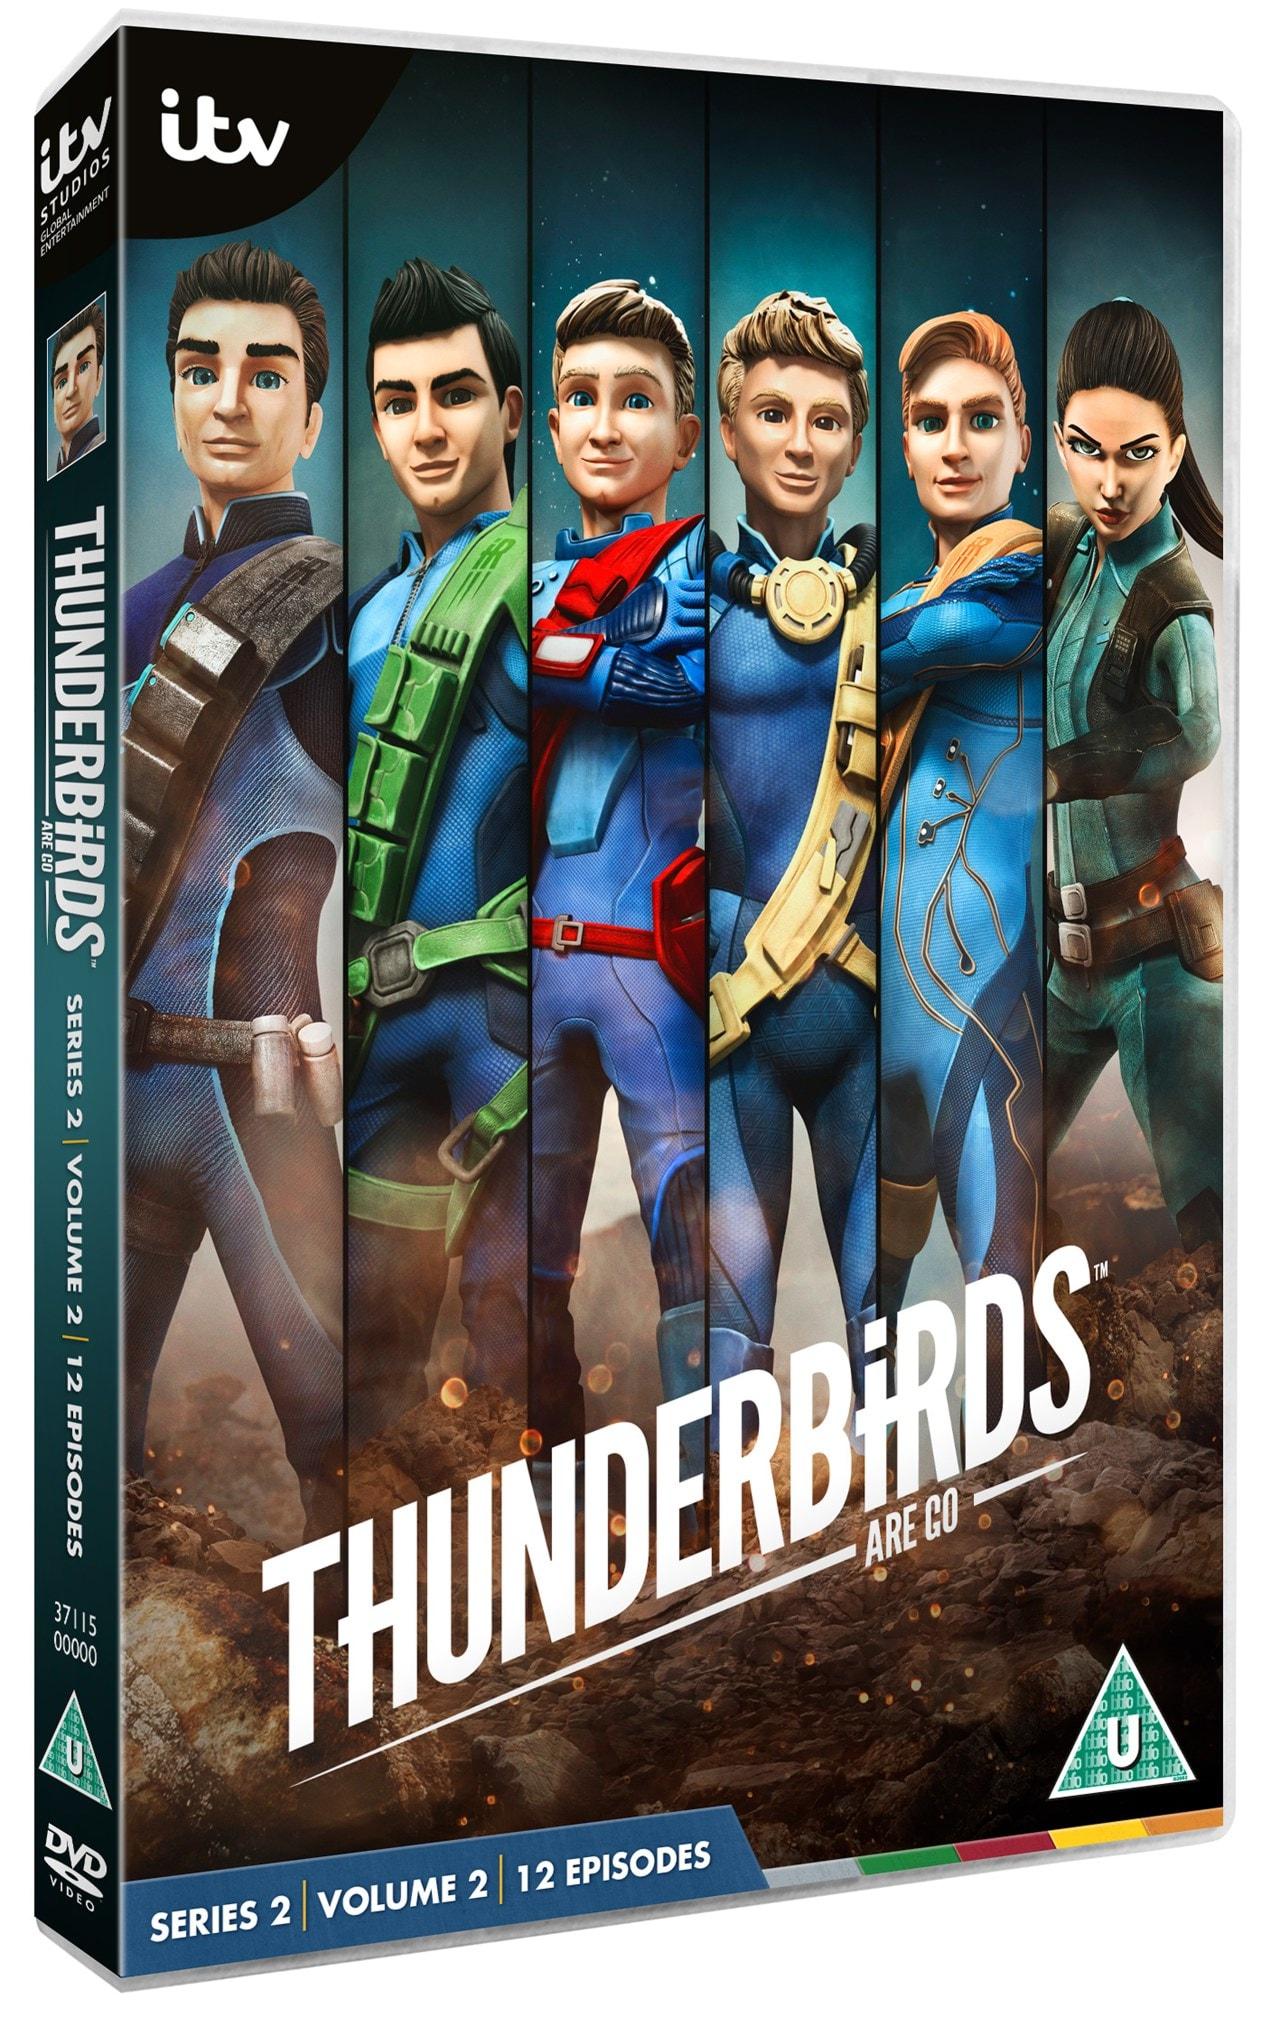 Thunderbirds Are Go: Series 2 - Volume 2 - 2